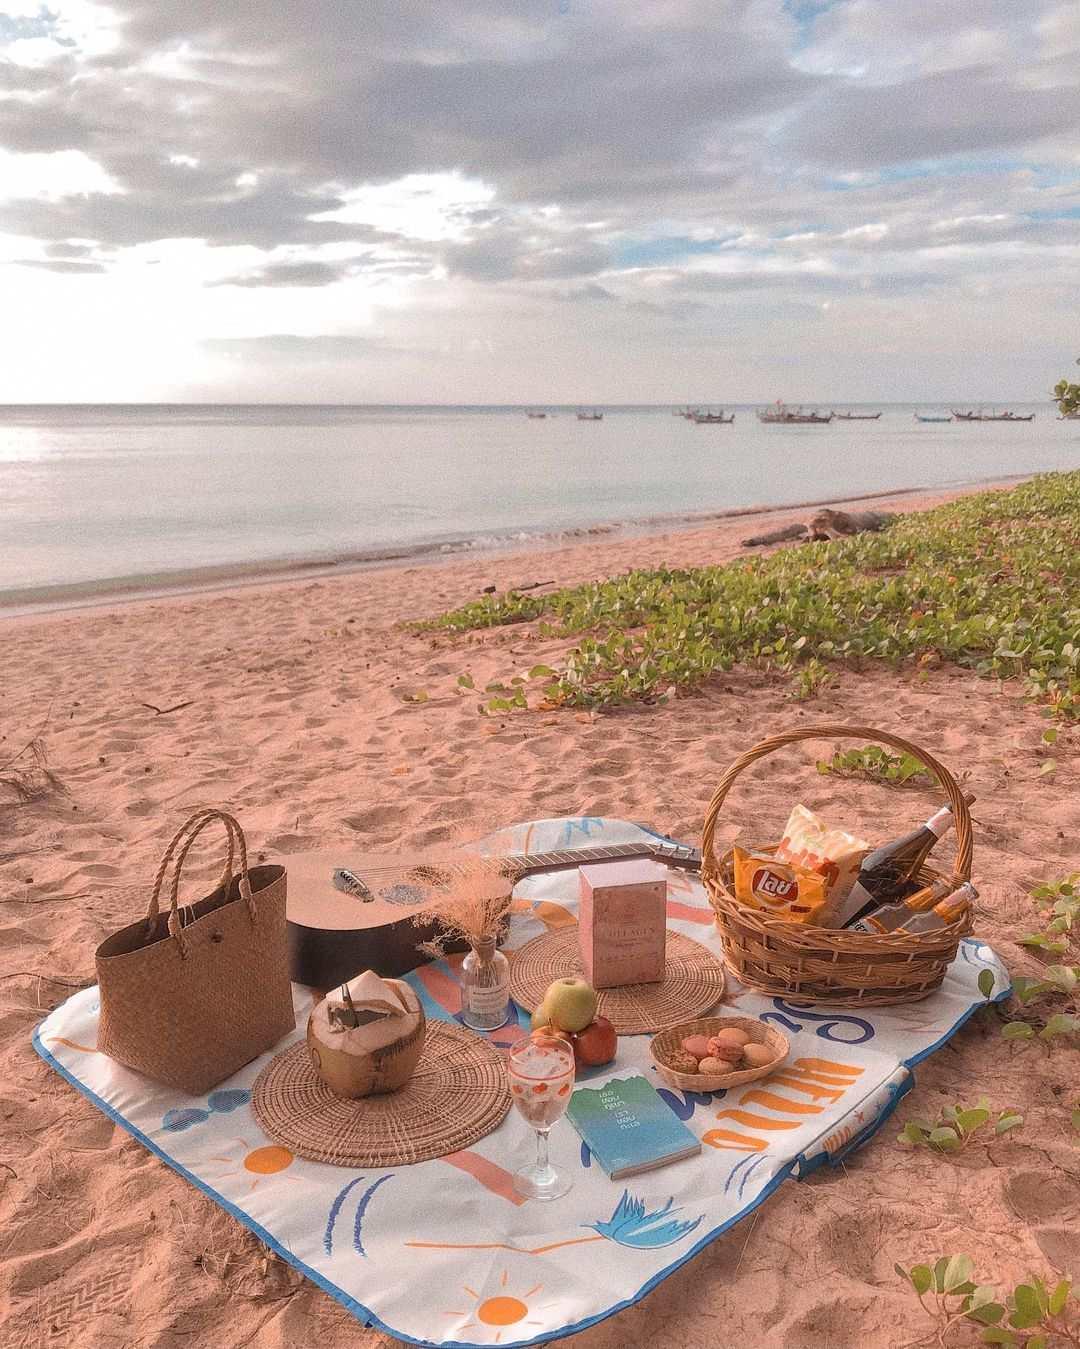 Picknick op het zand van Nai Yang Beach op Phuket